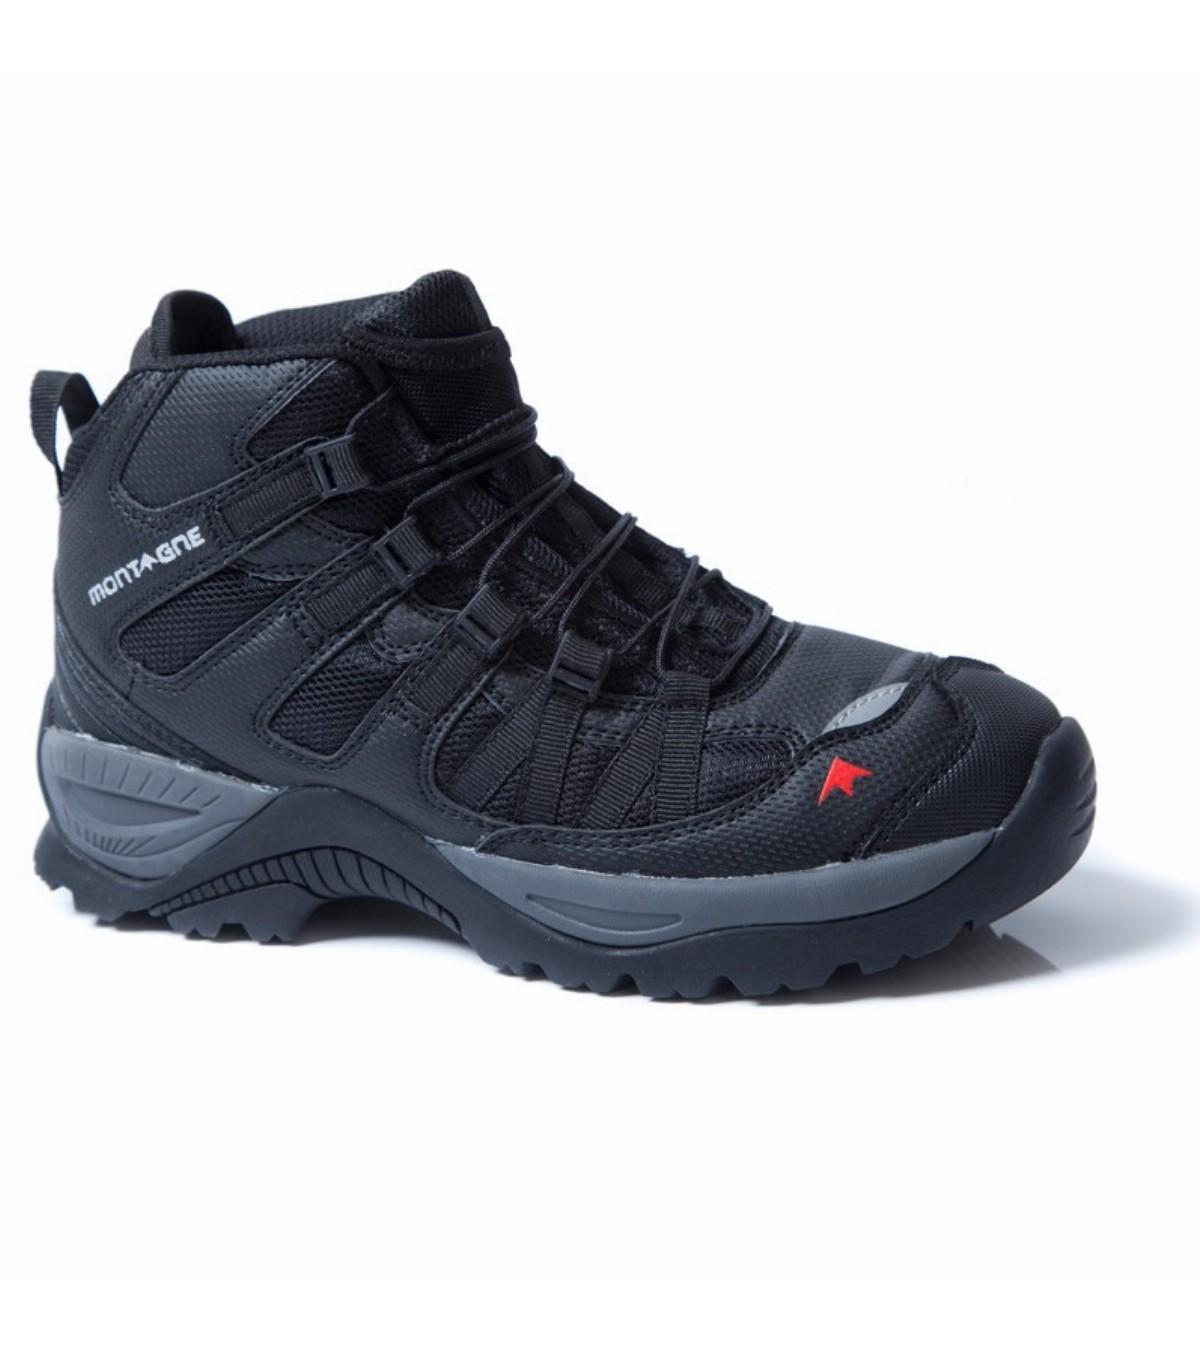 Botas de hombre Queva - Zapatillas Montagne de hombre QUEVA